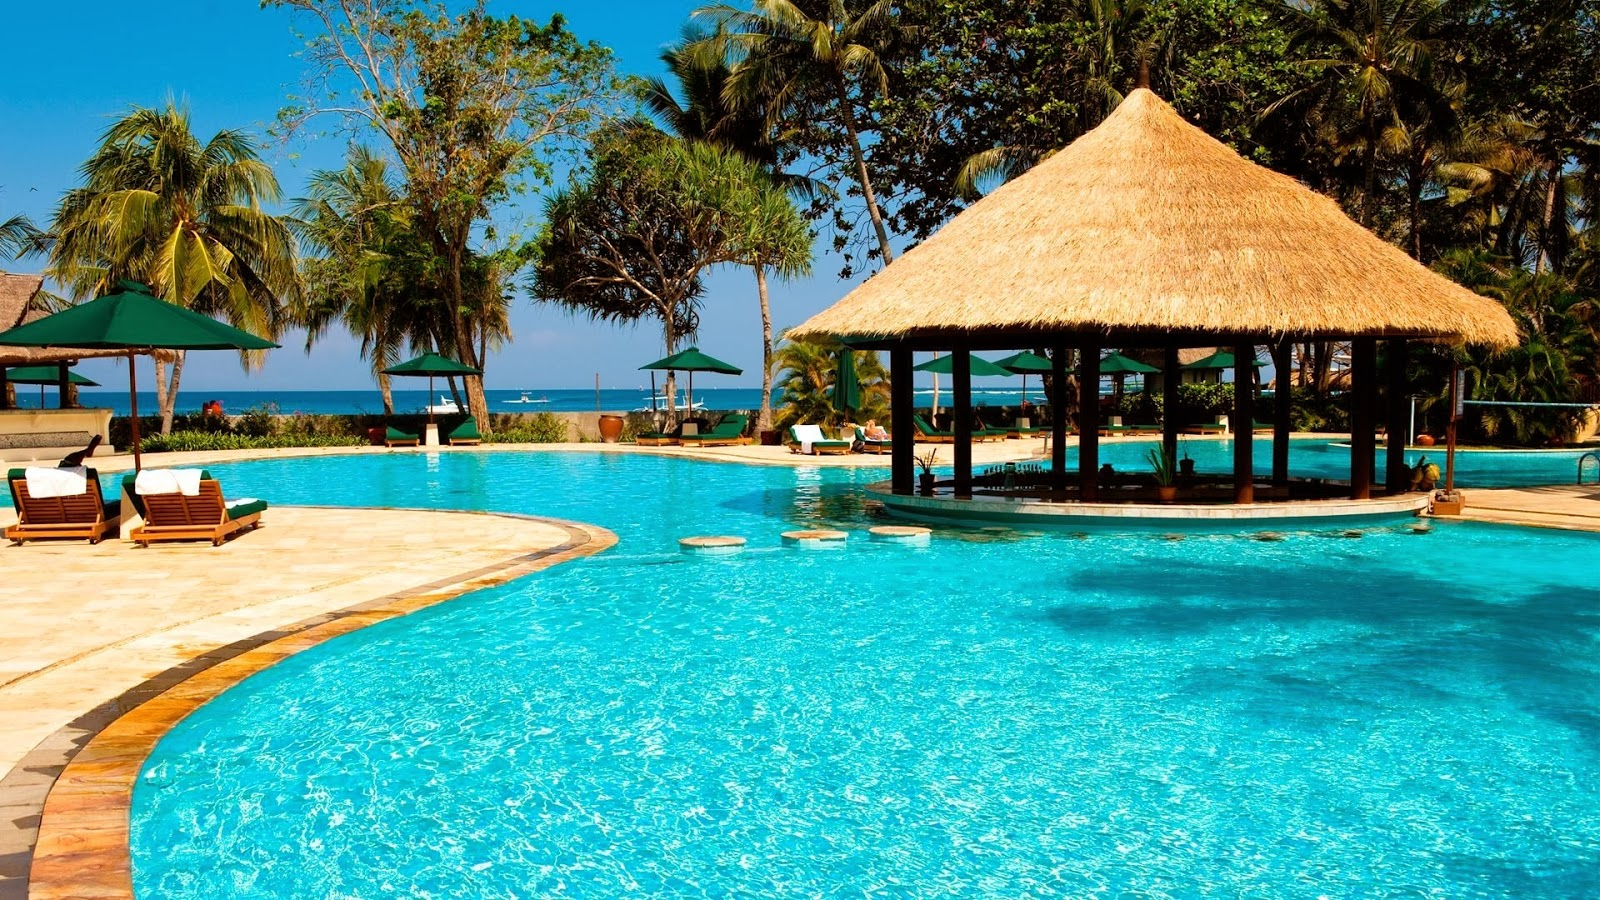 SeaShore And Beach Resorts Wallpapers